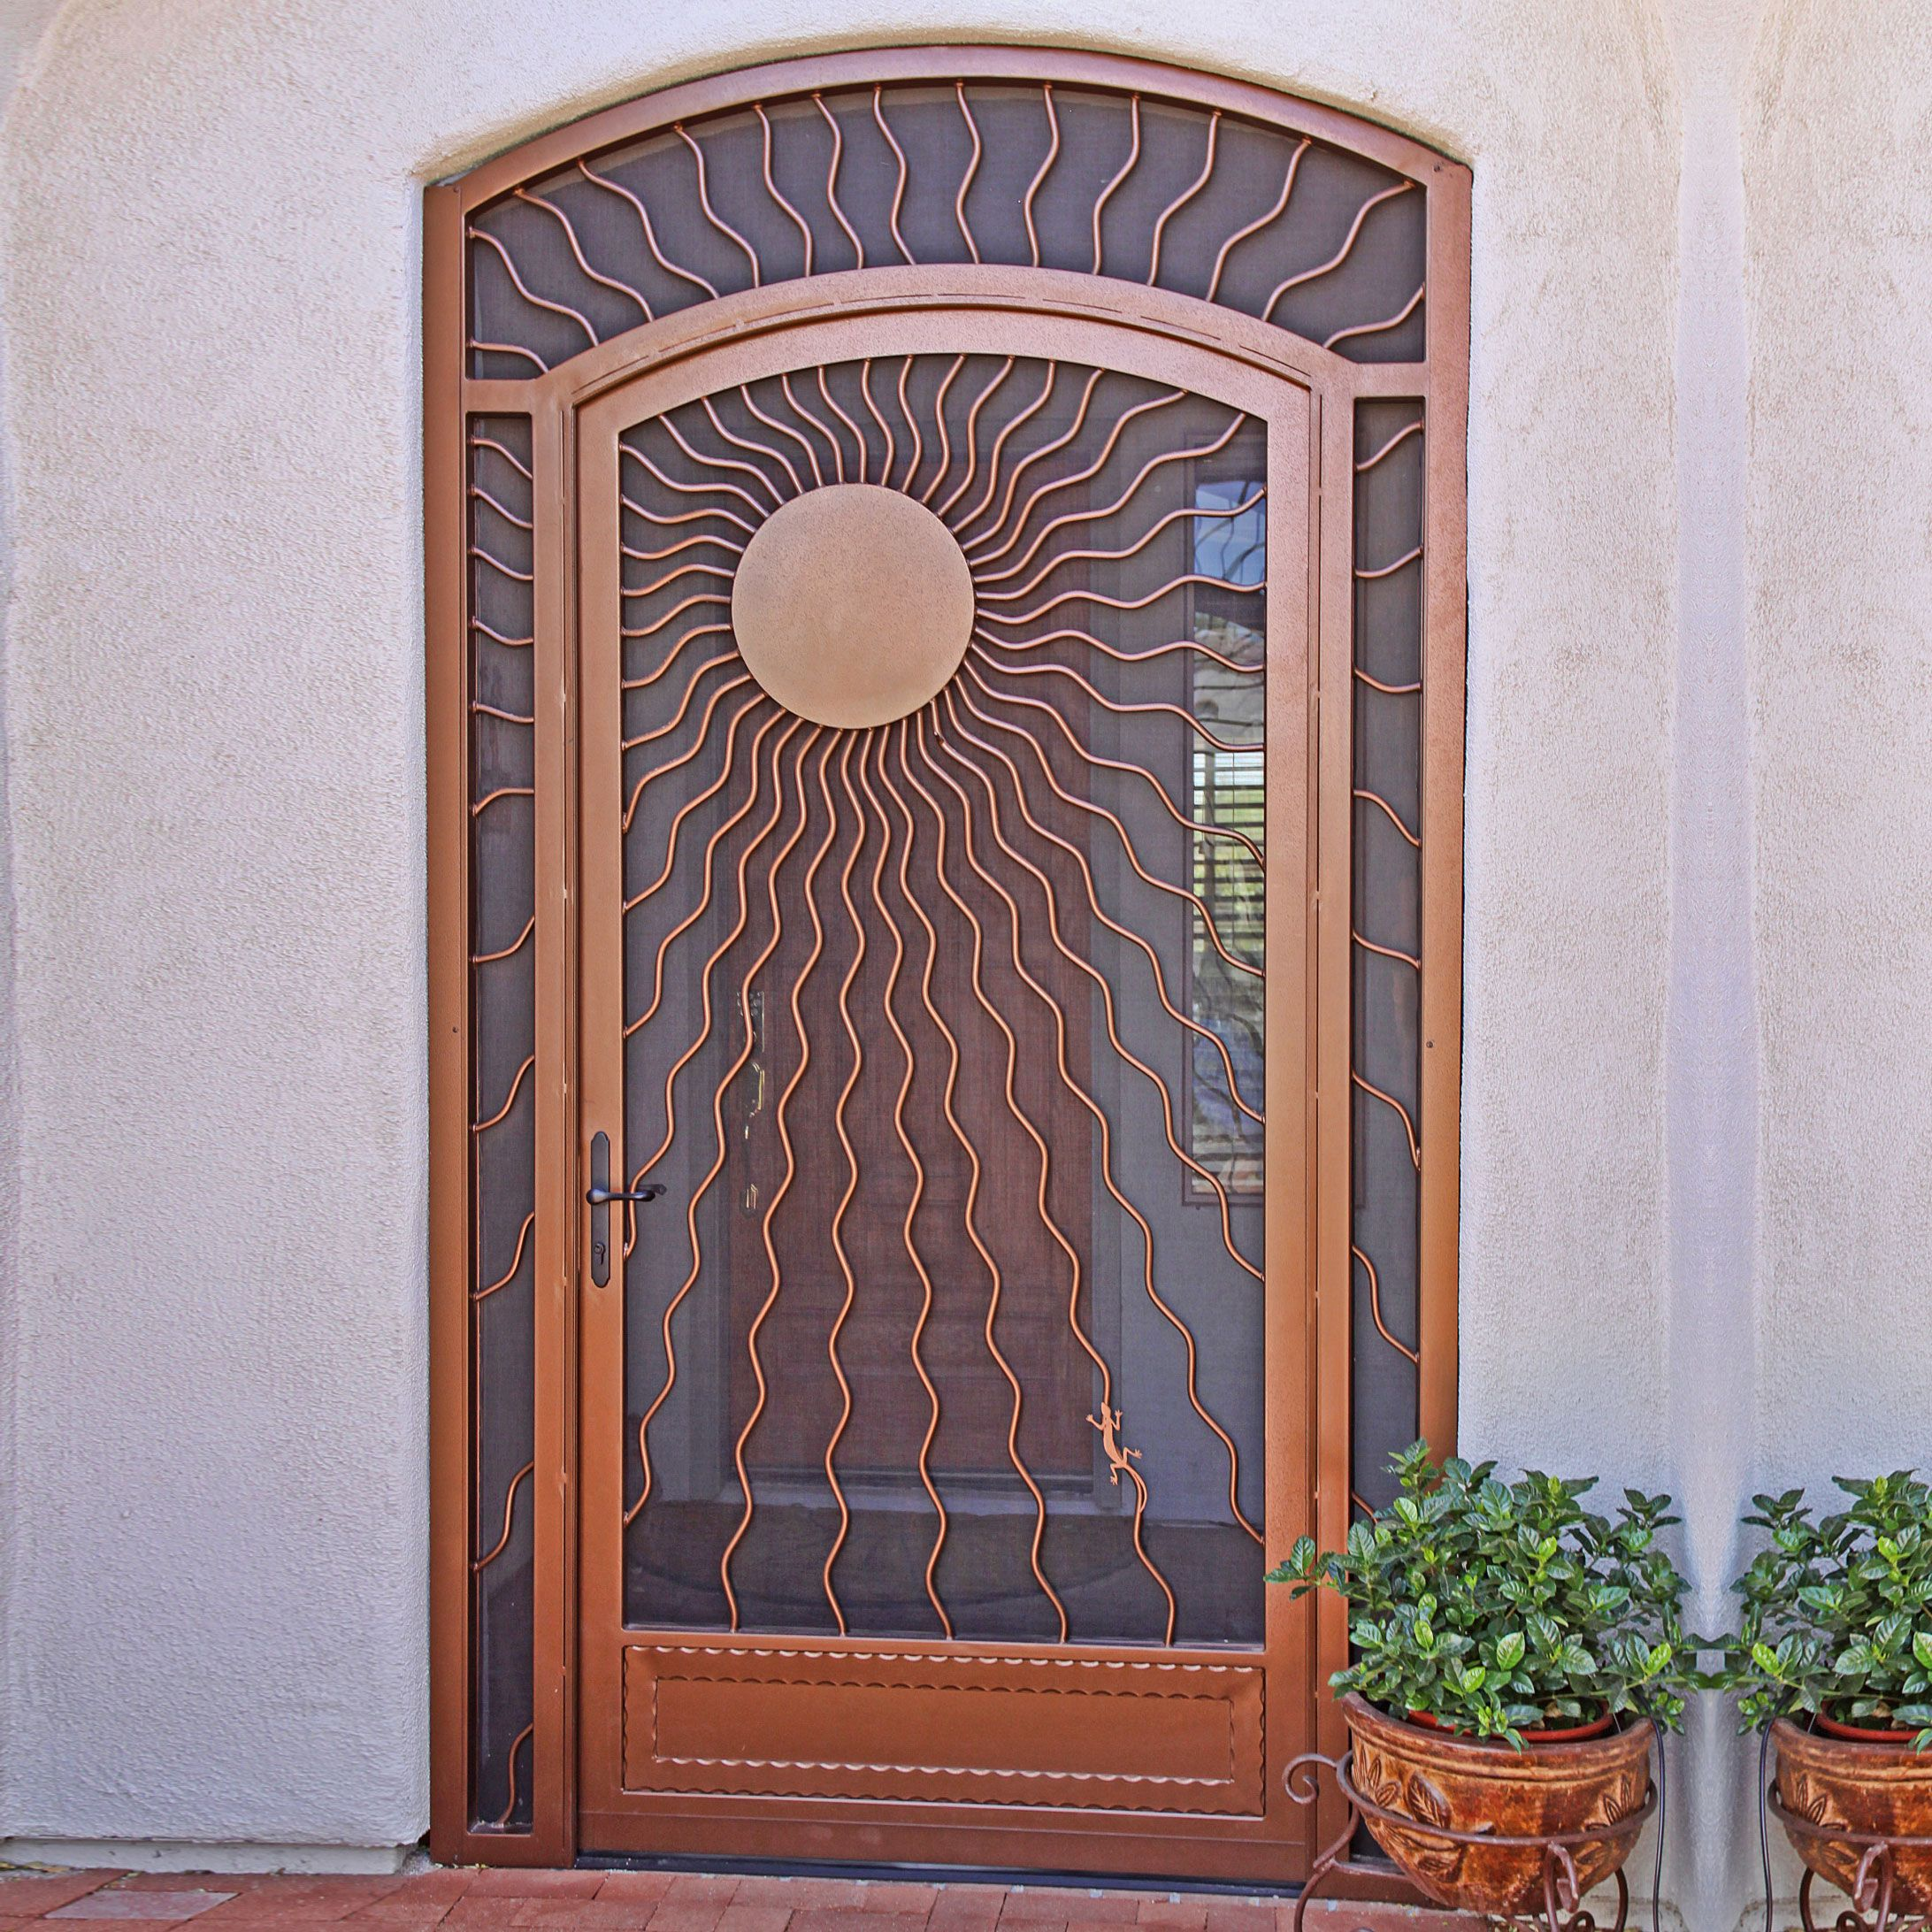 Sunray First Impression Security Doors Security Door Fire Alarm Home Security